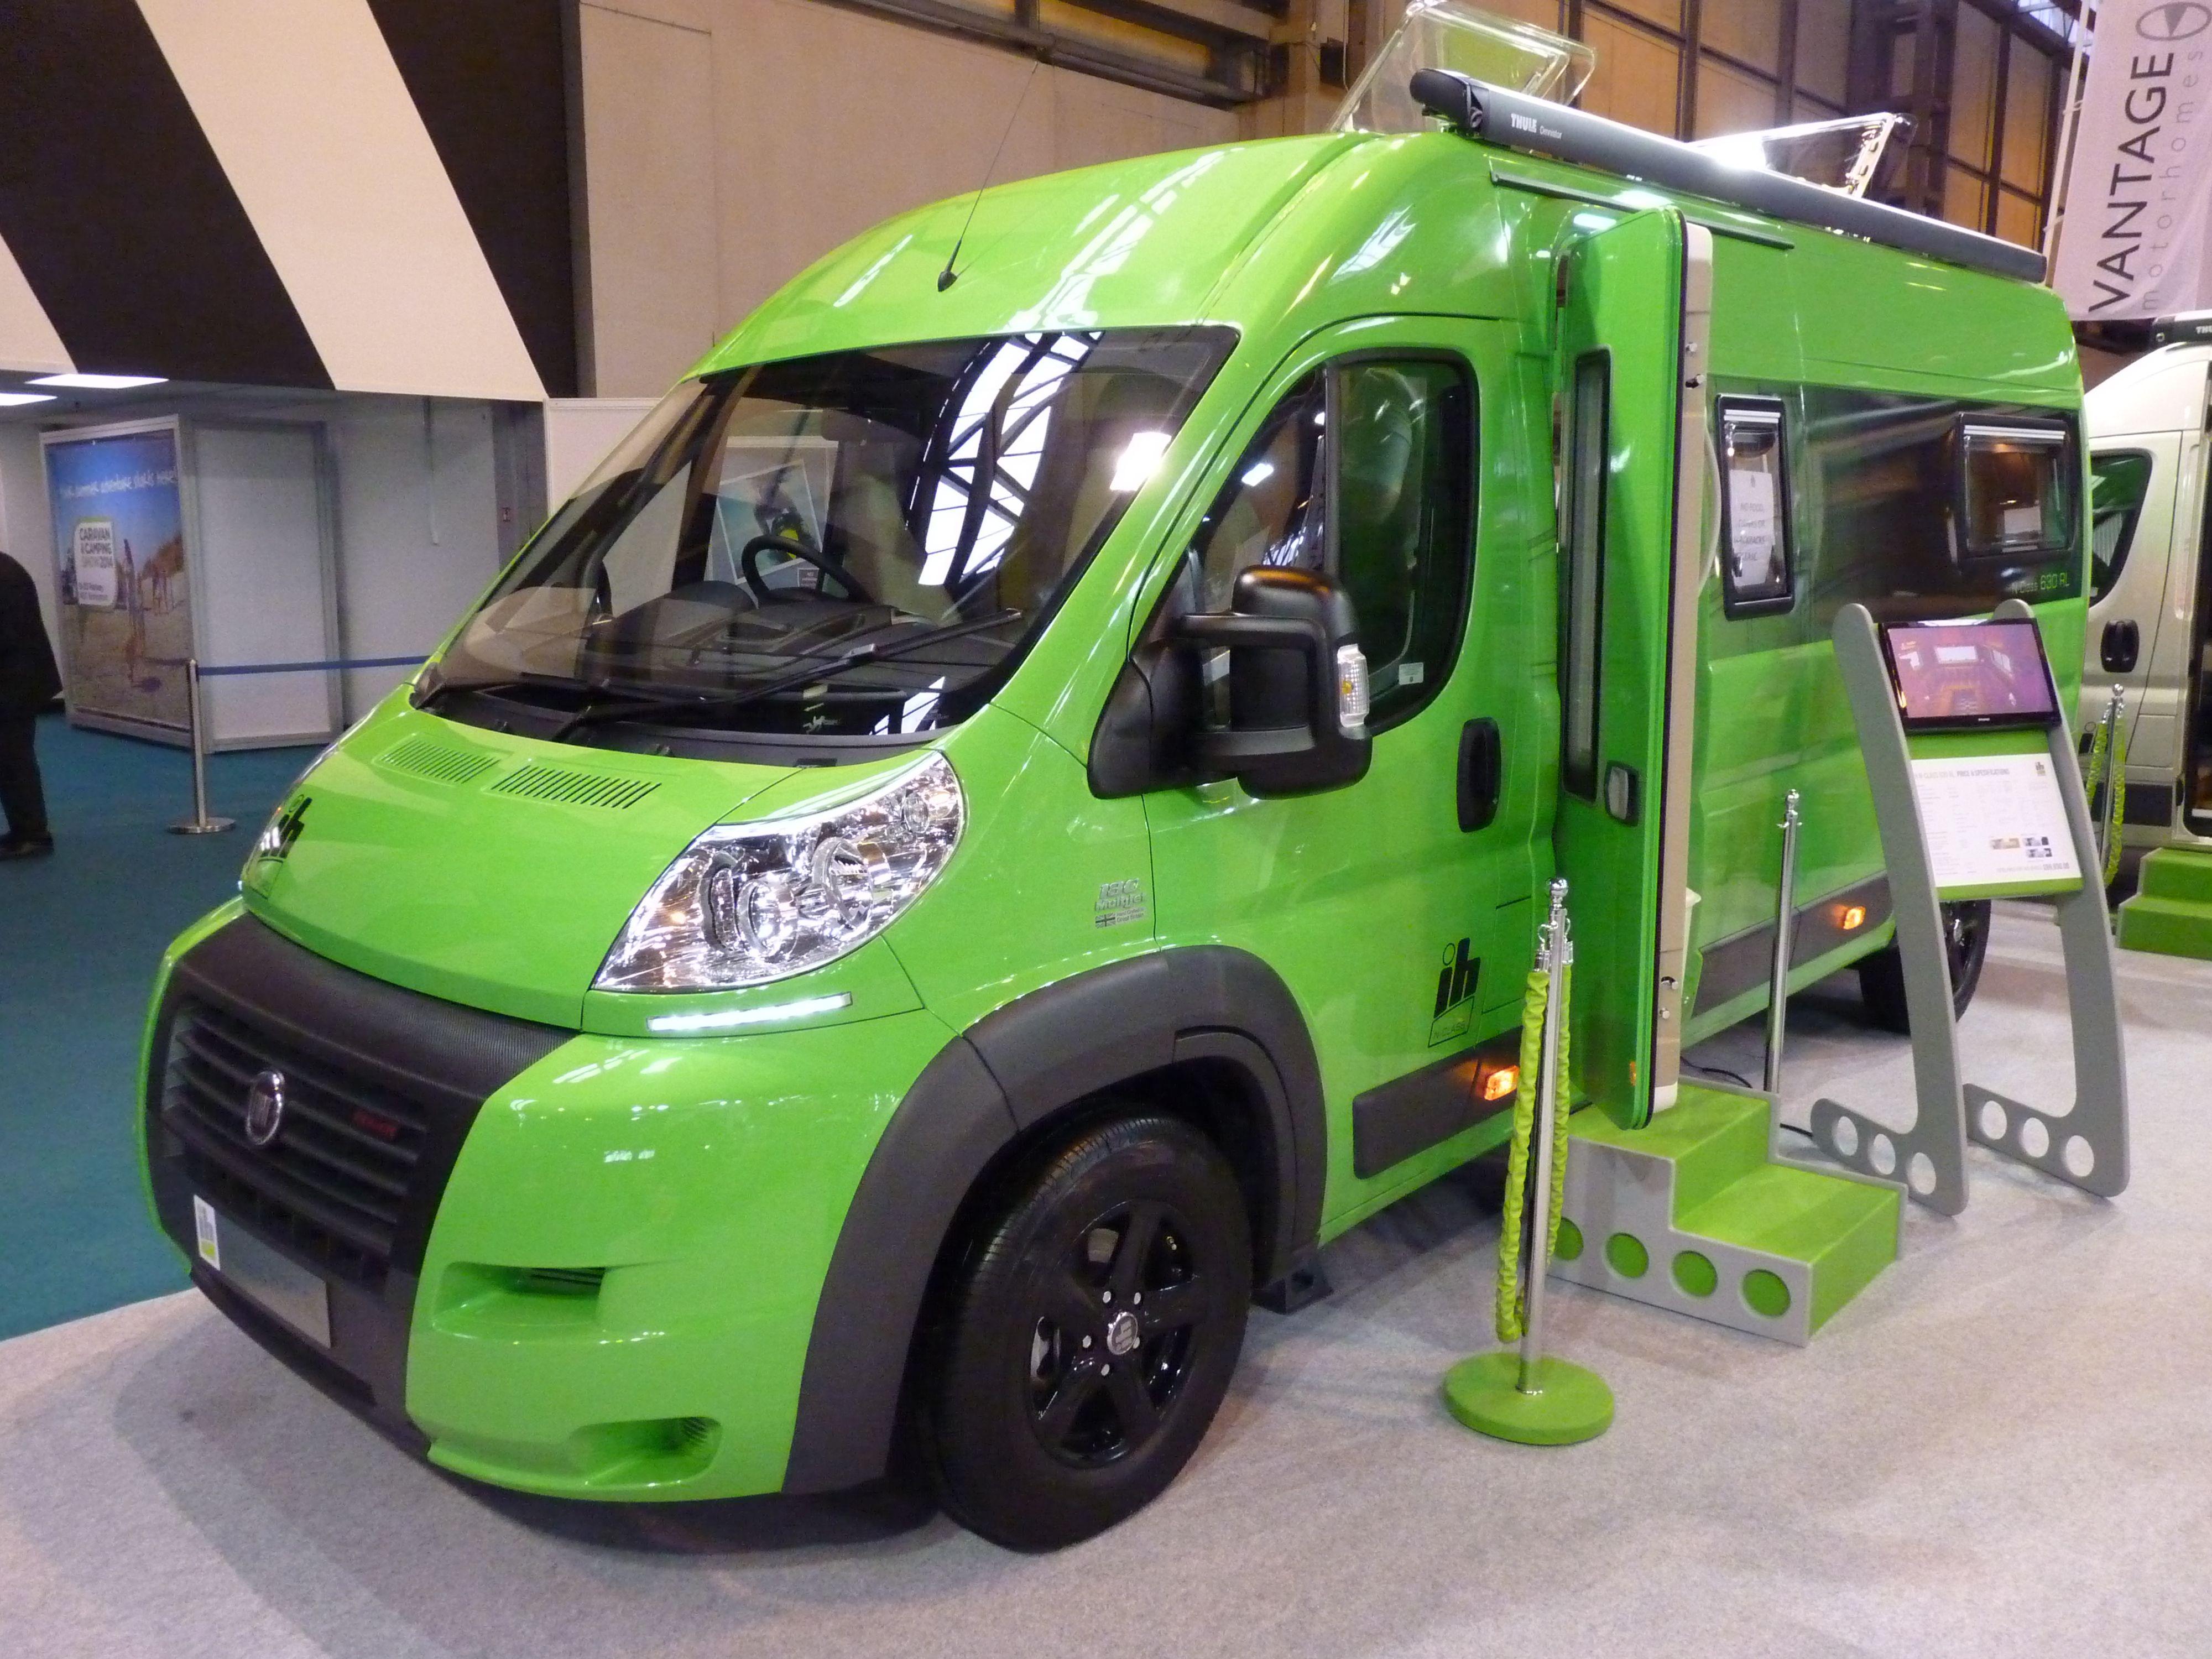 service fiat ducato new ambulances professional chooses of ambulance west fleet maxi for f midlands its